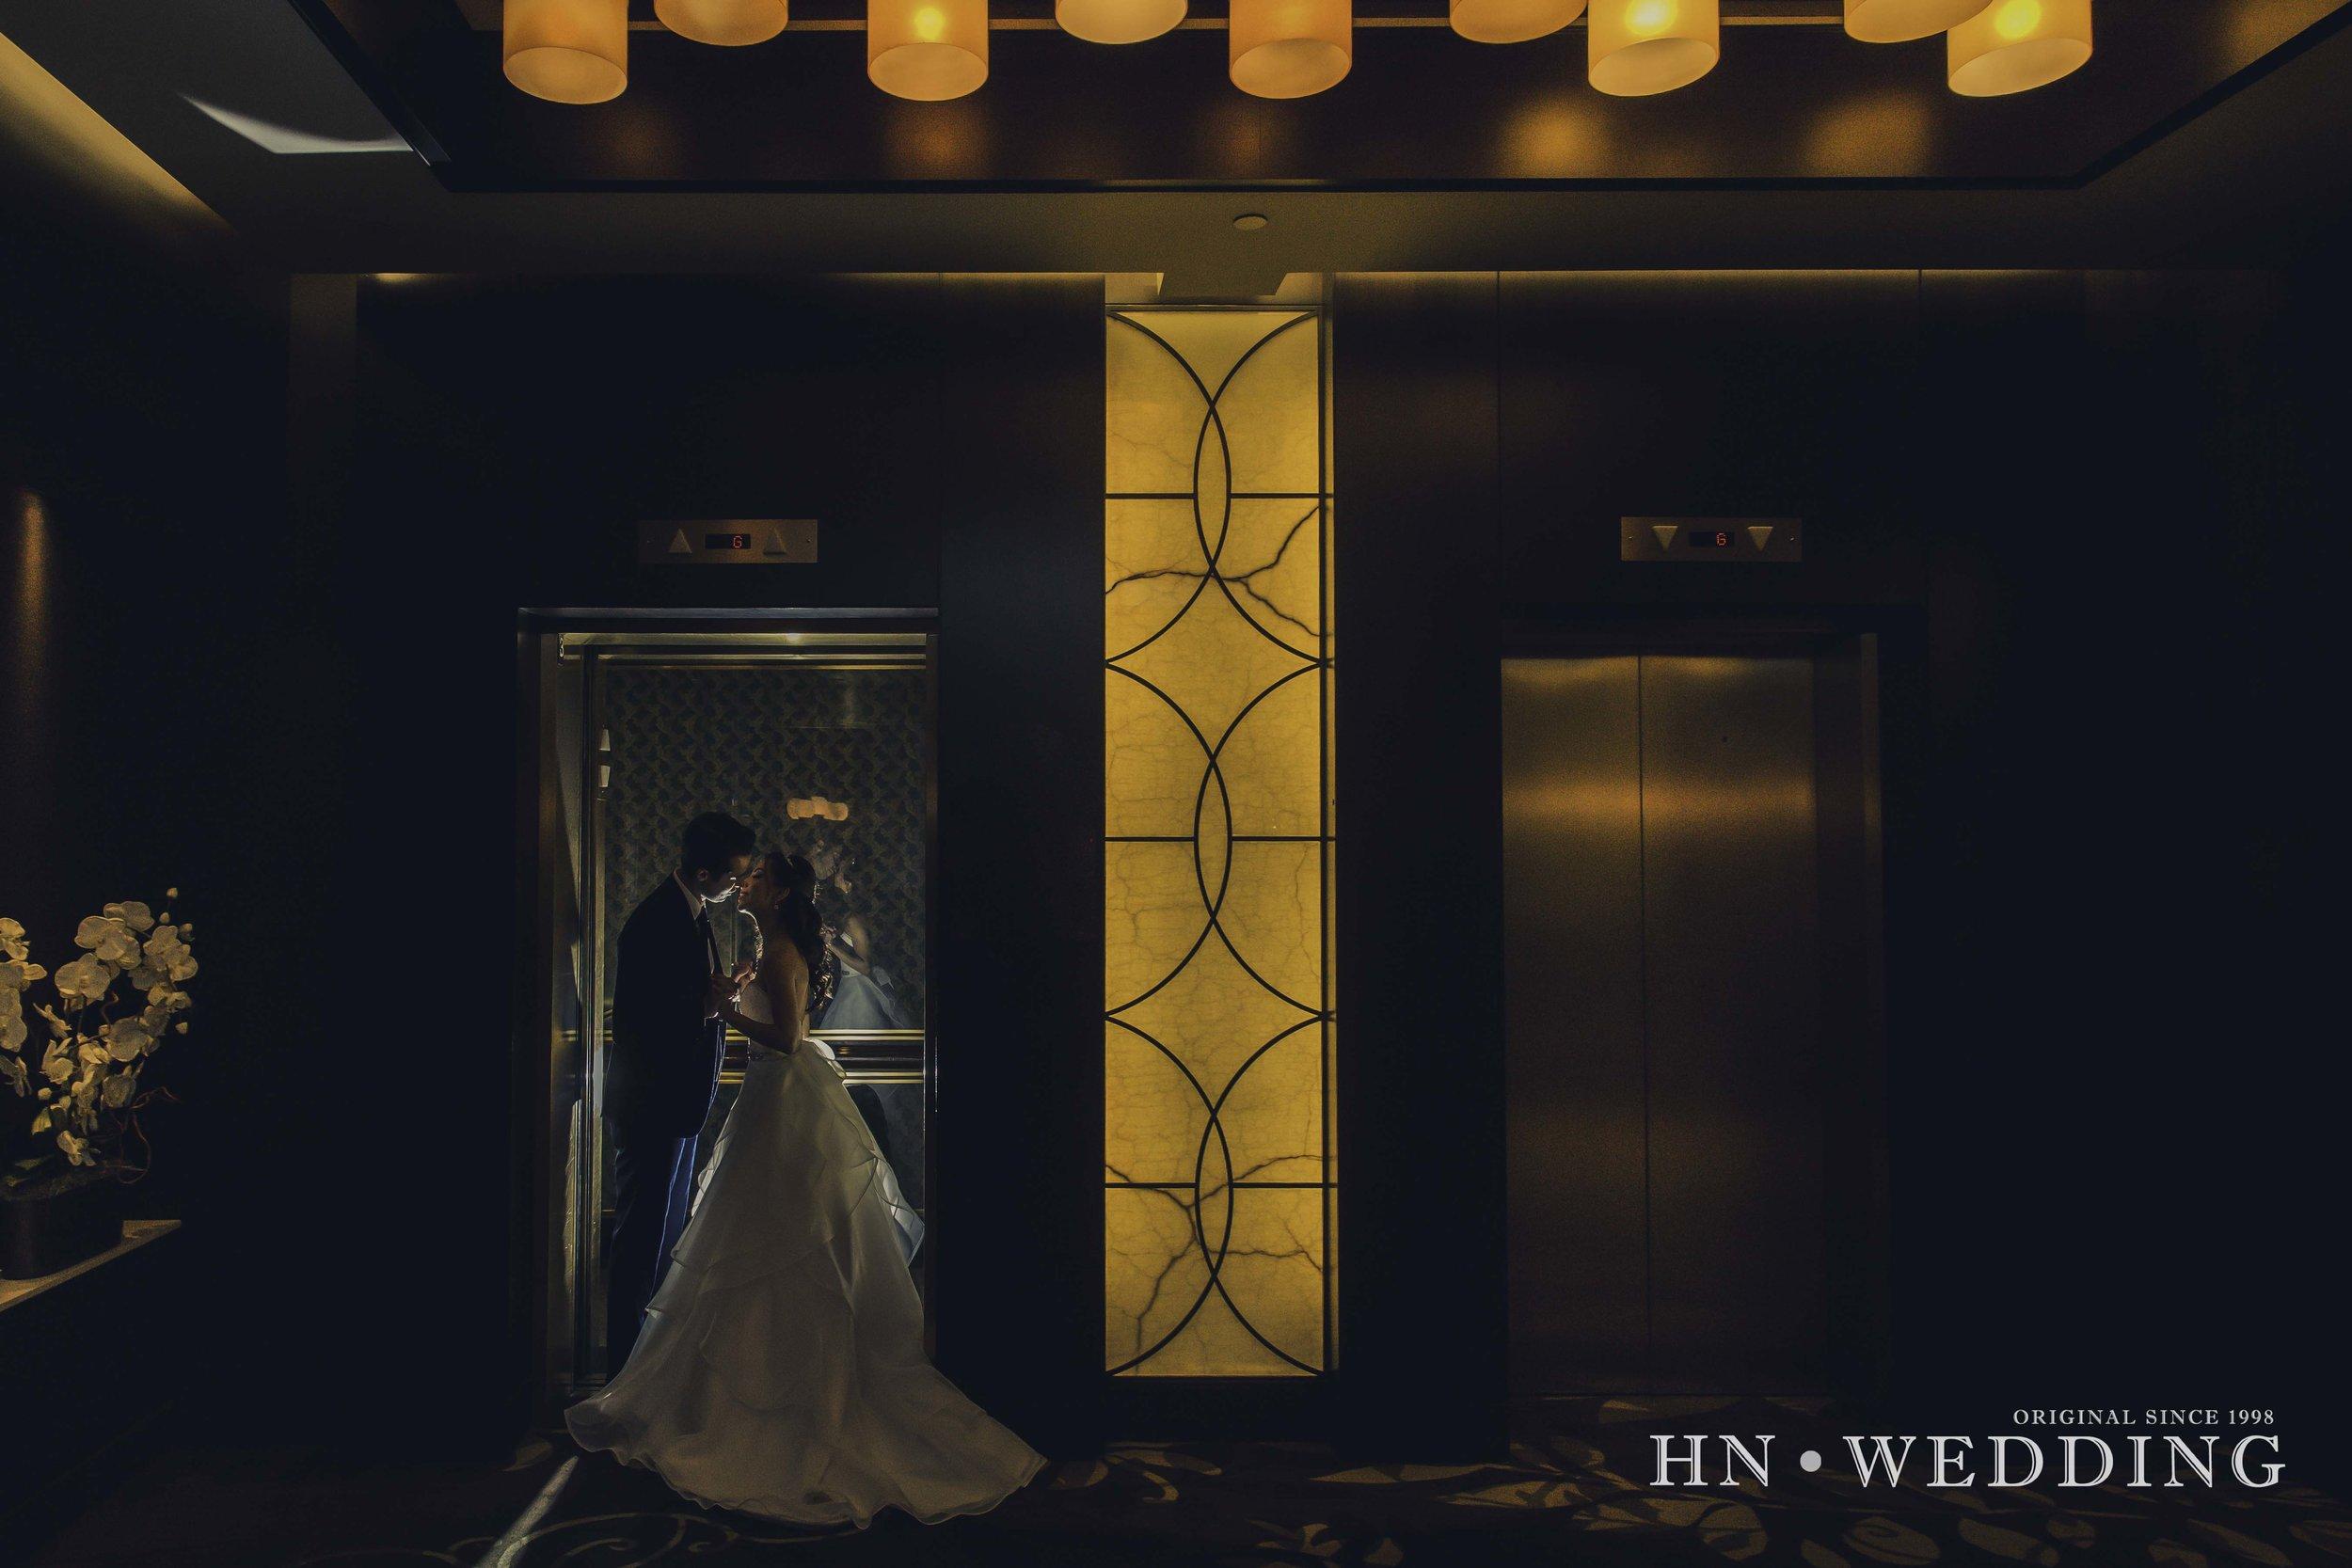 HNwedding-20161012-wedding-4377.jpg